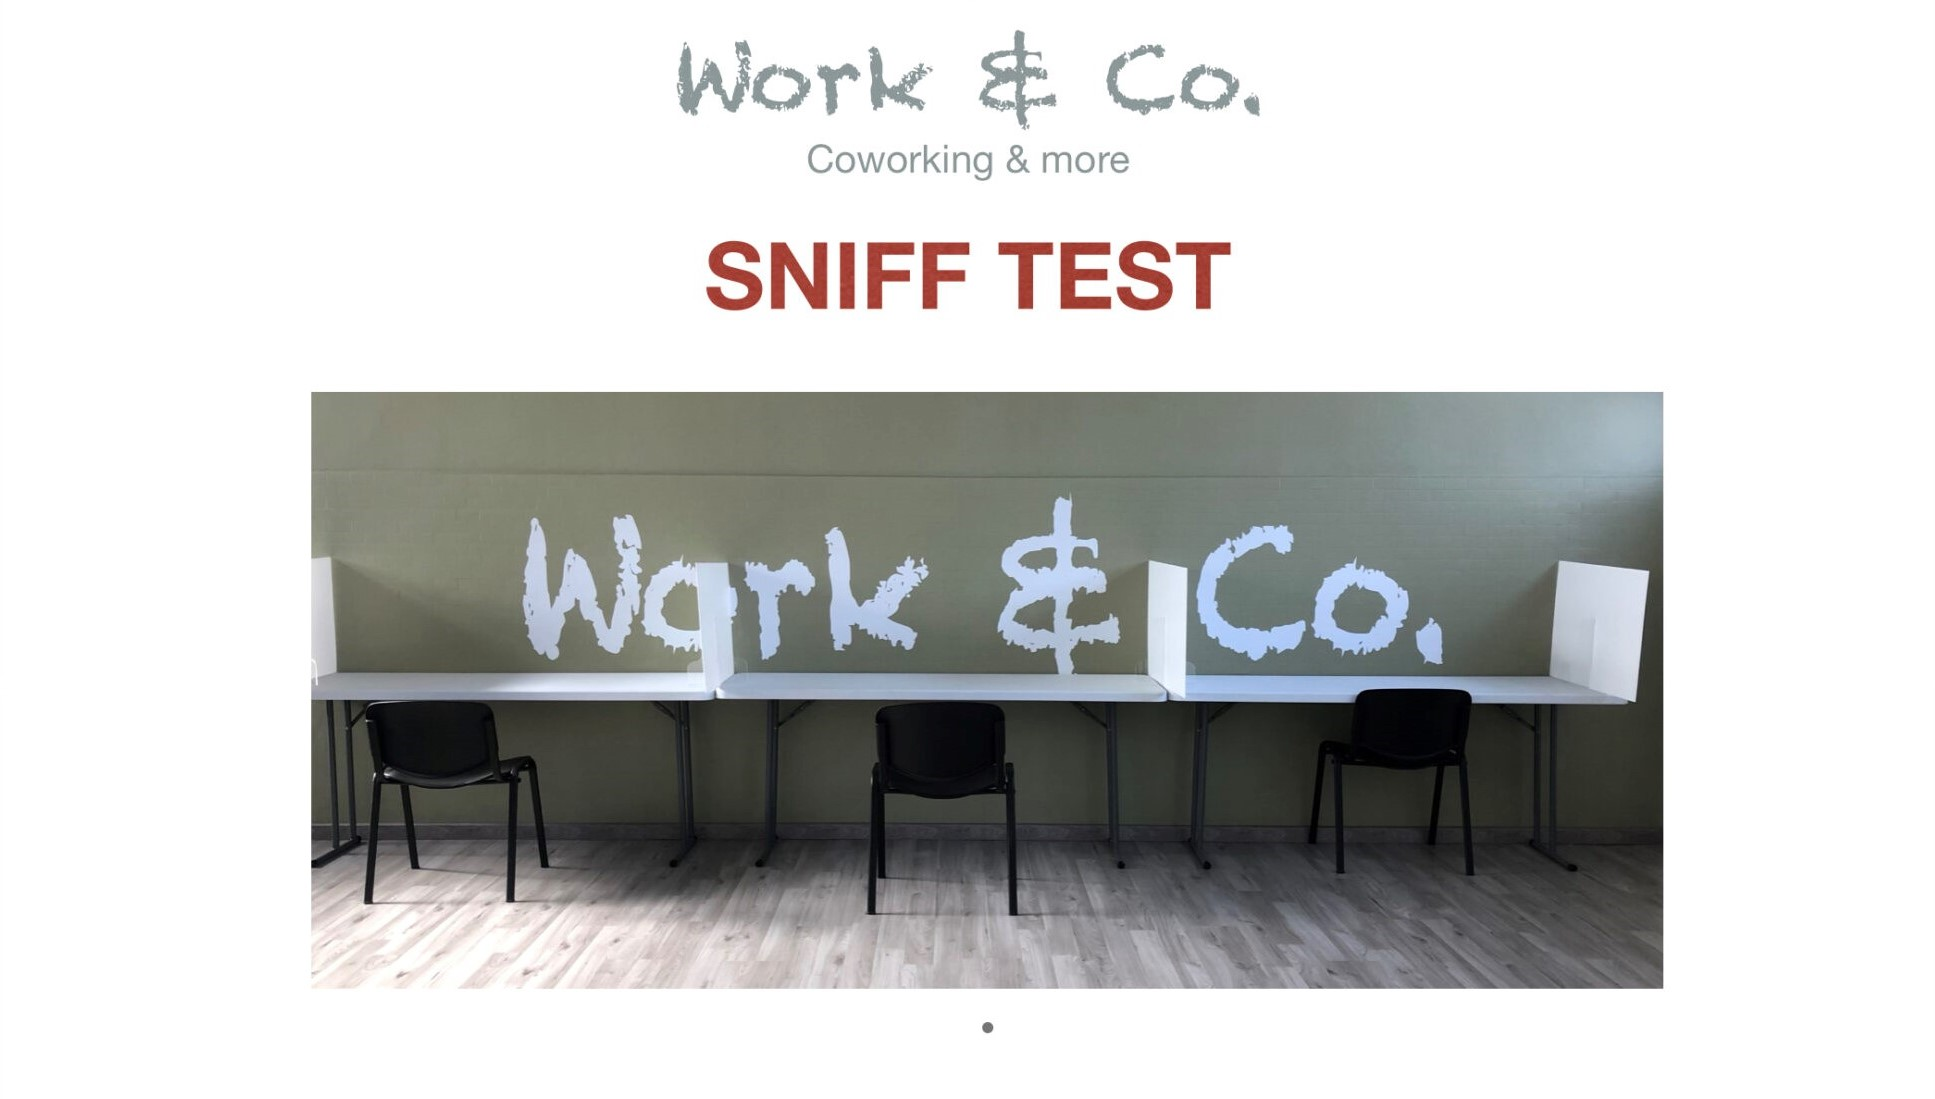 Sniff test: un'indagine su fragranze di detersivi per lavatrici